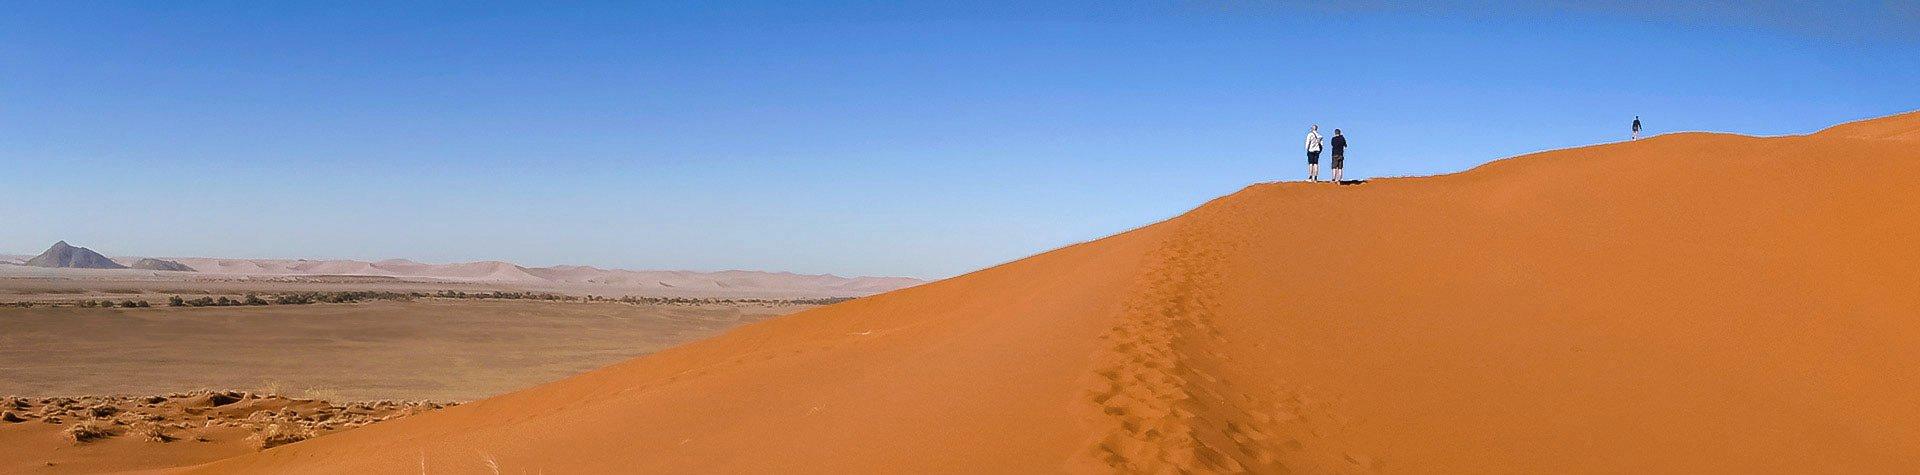 Namibia_Photo Tour by Krijn van der Giessen Photography